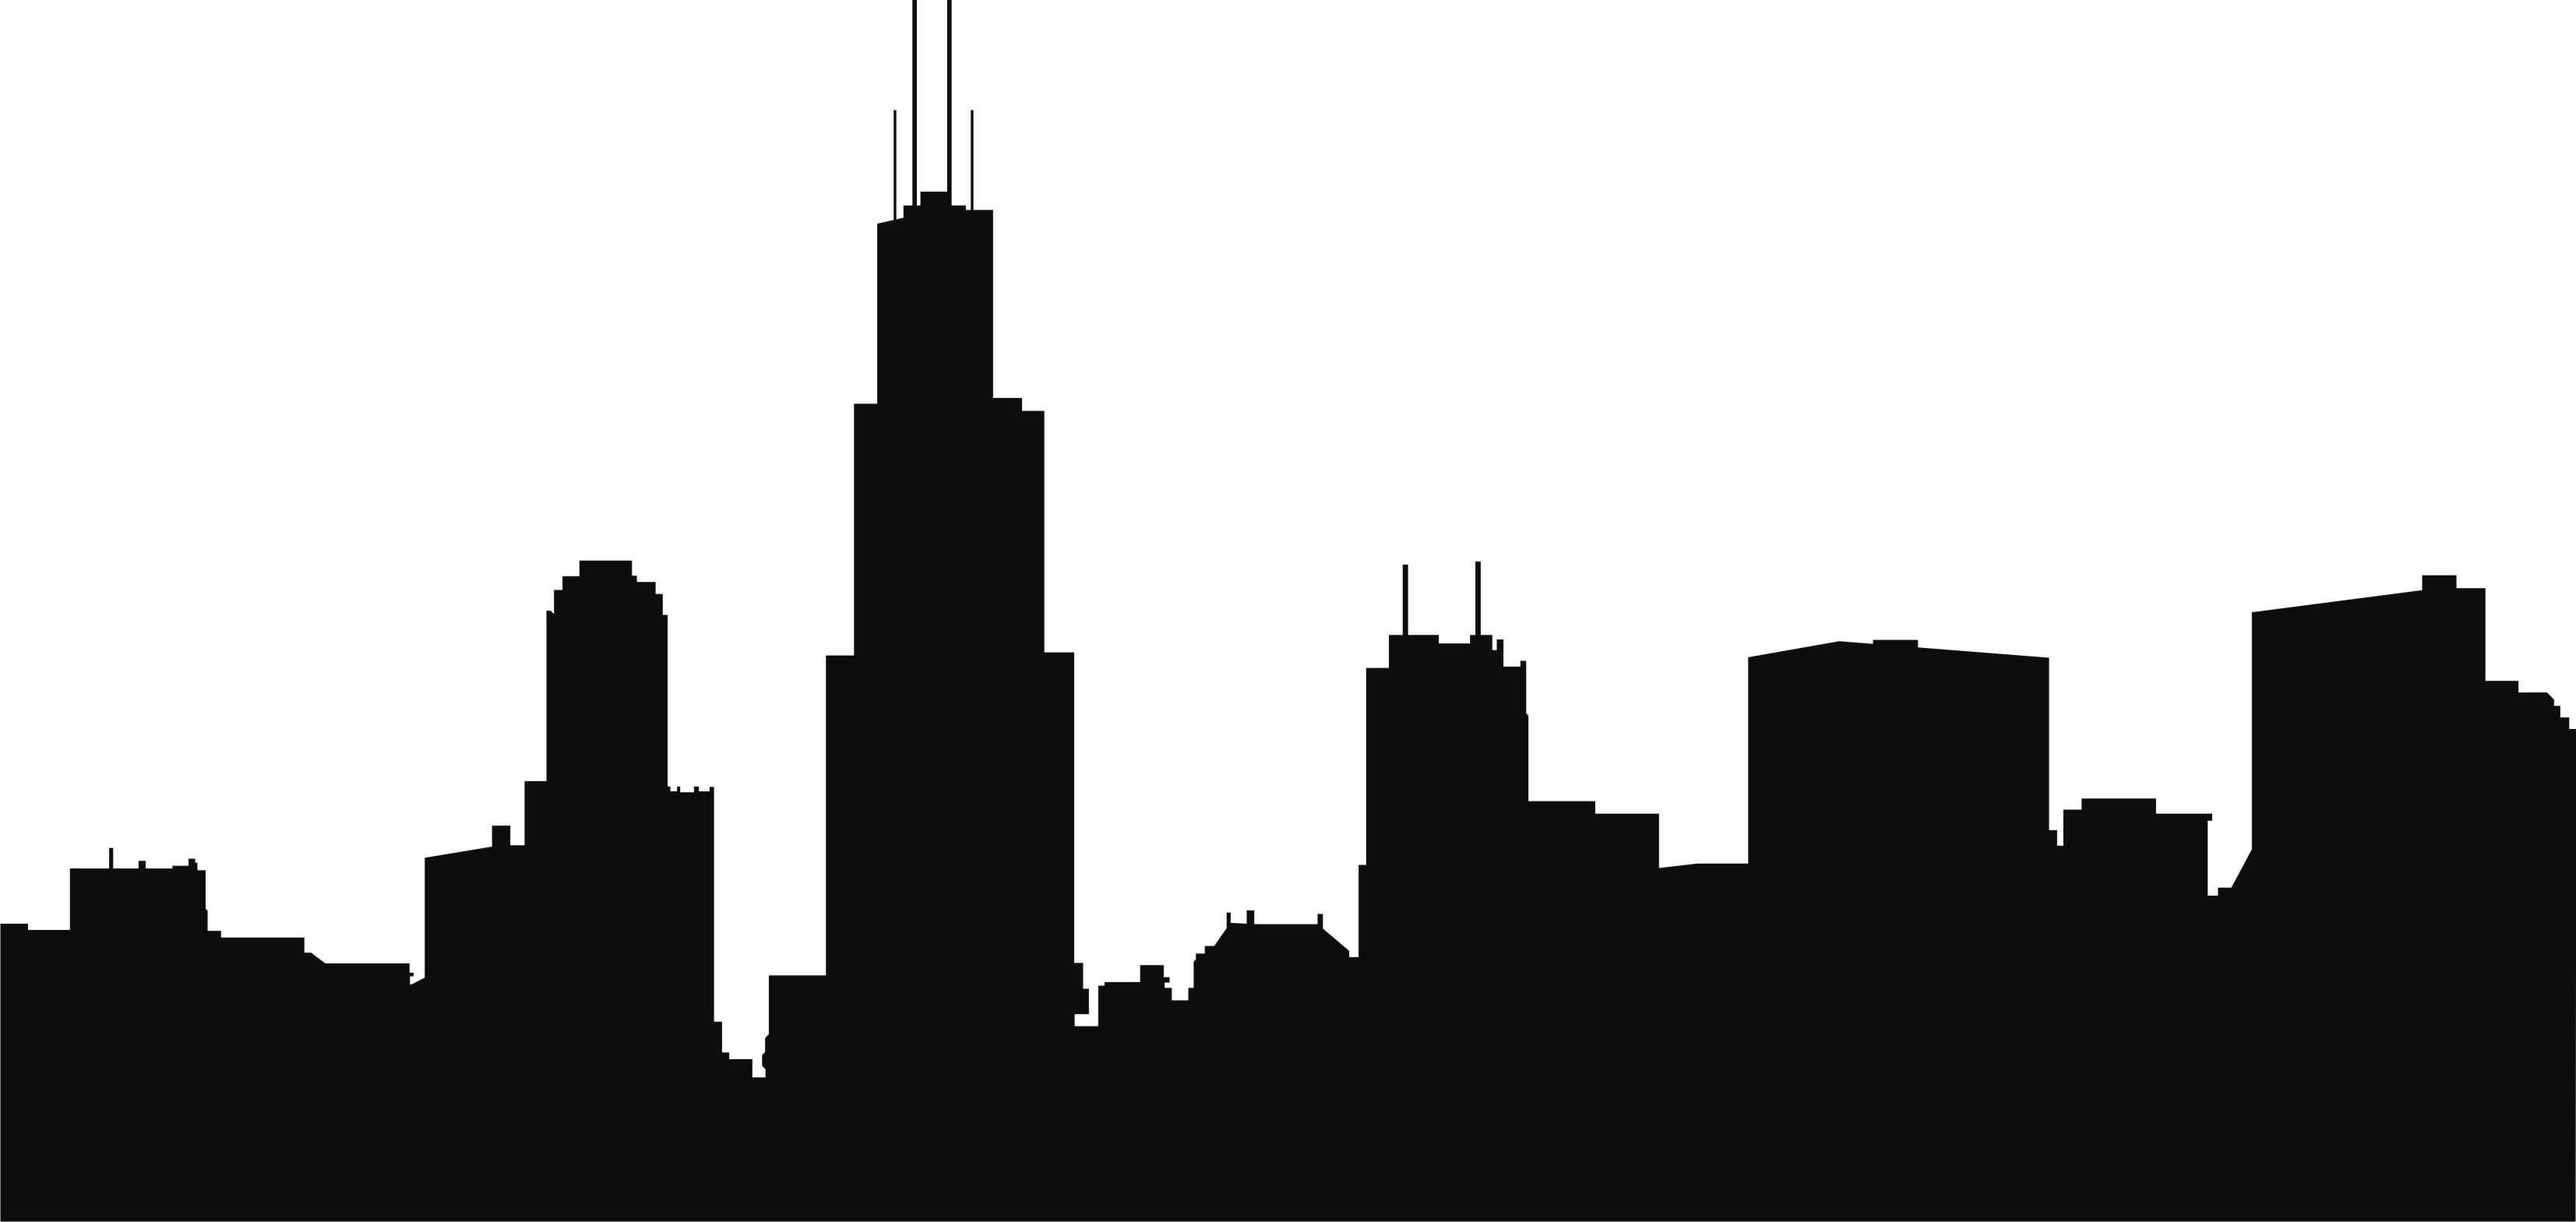 city skyline outline simple - photo #32